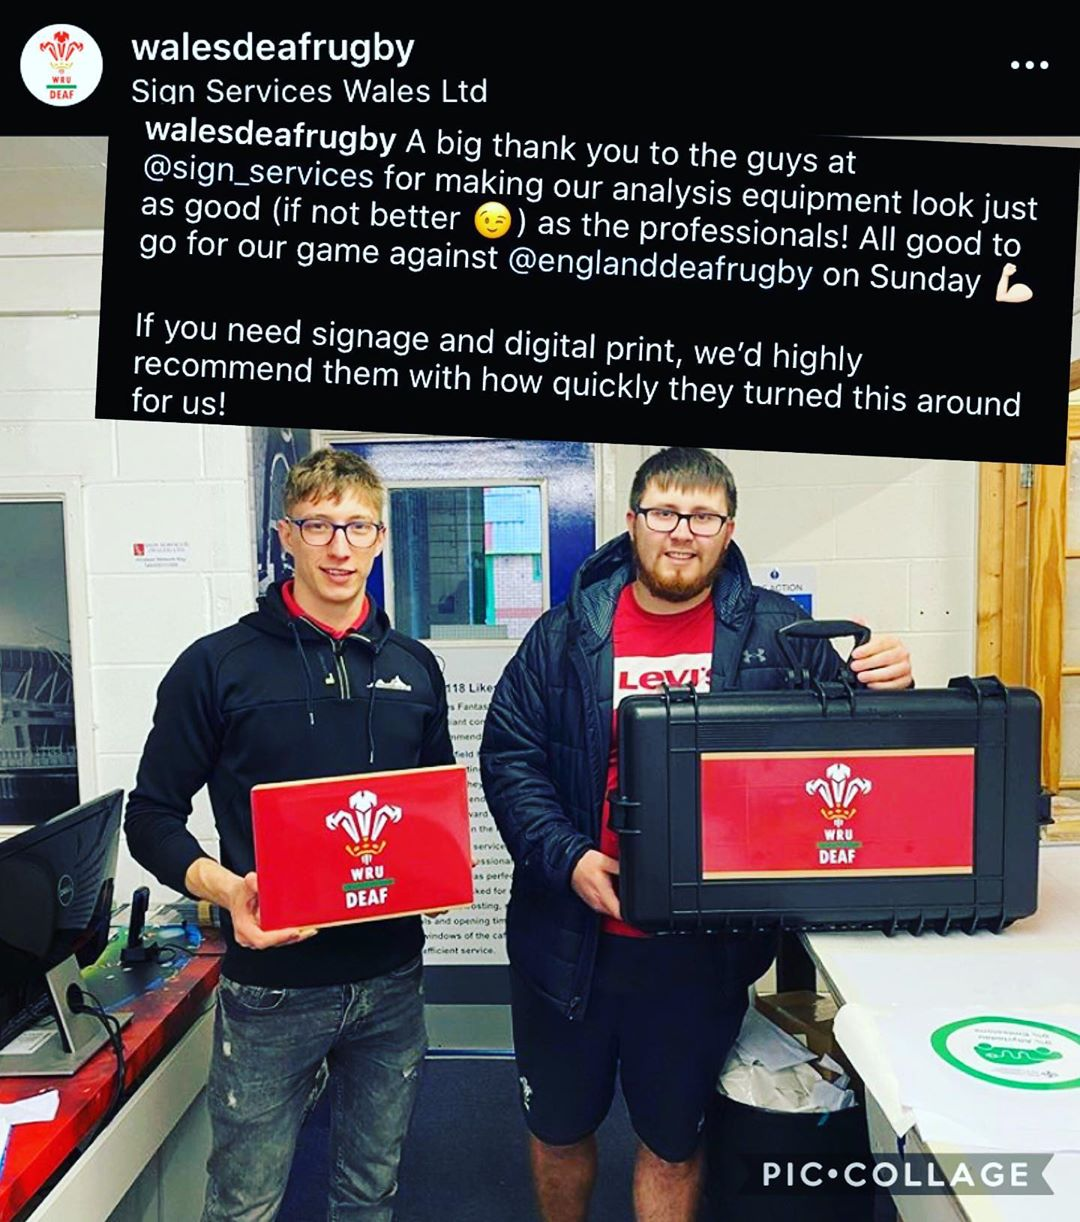 Laptop skins and equipment branding sullied for WRU deaf team 🏴